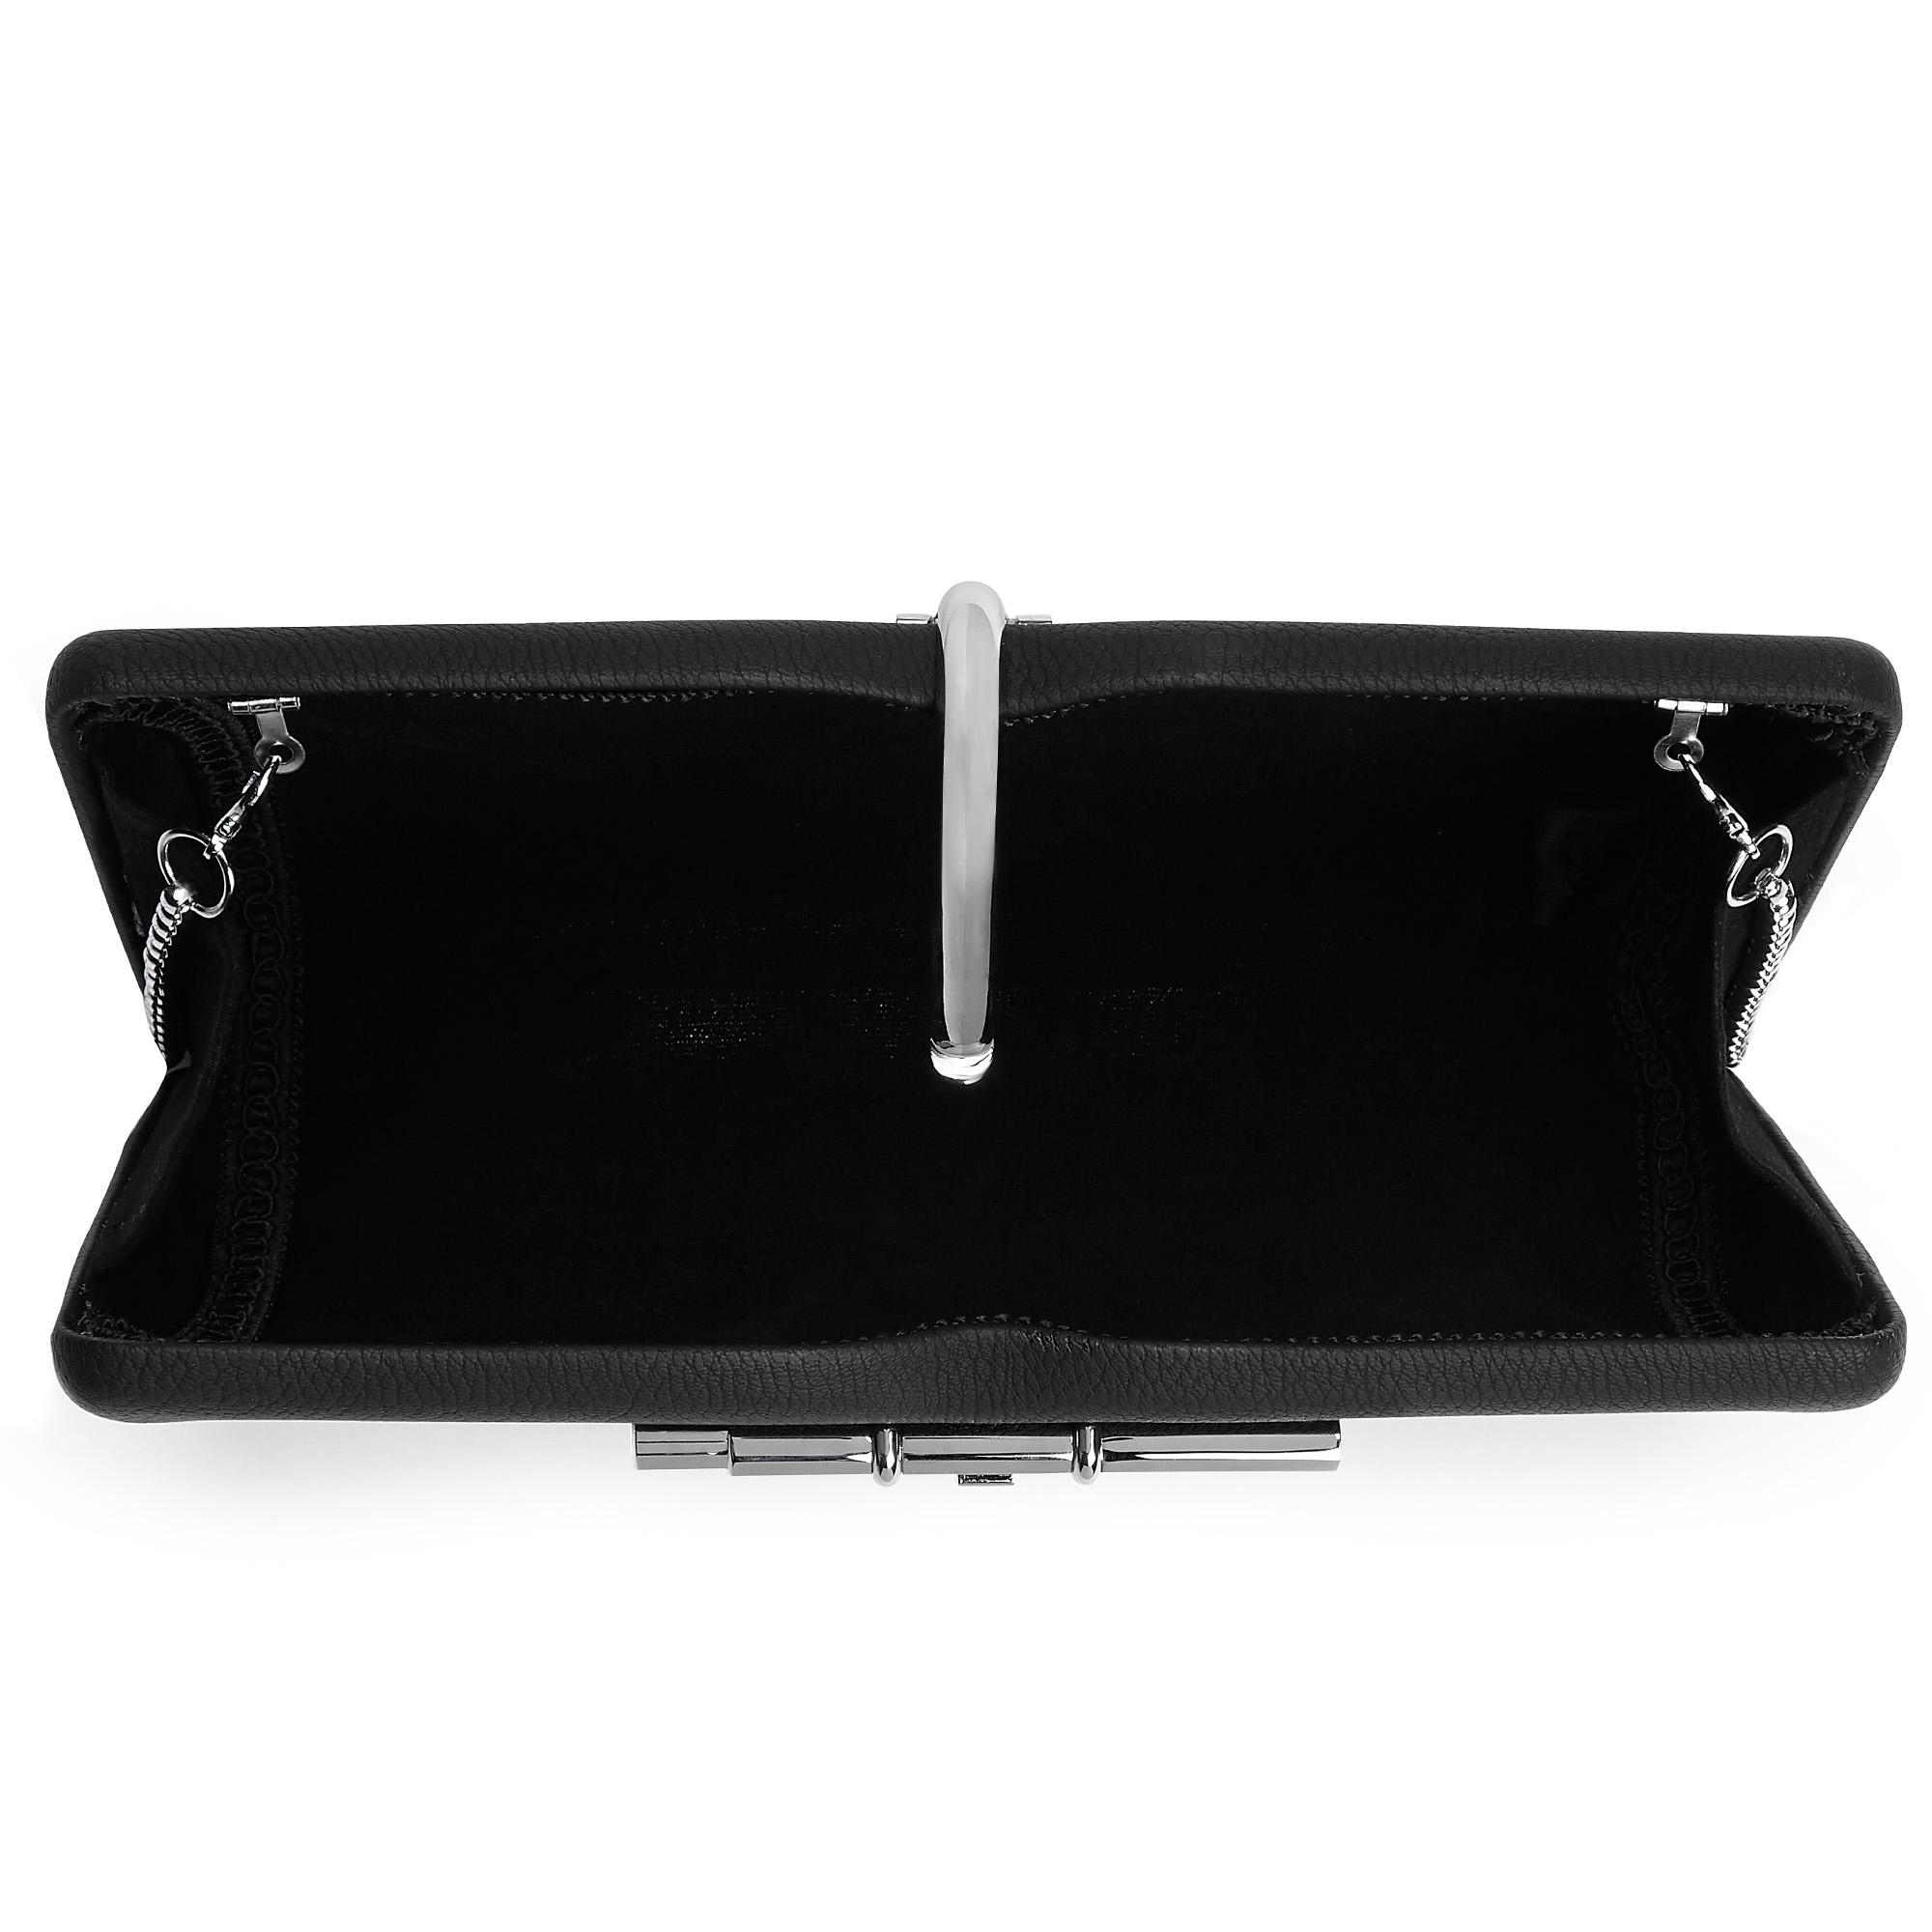 ddffe4e09 Allegro Vegan Black Clutch Bag – Alwayschic